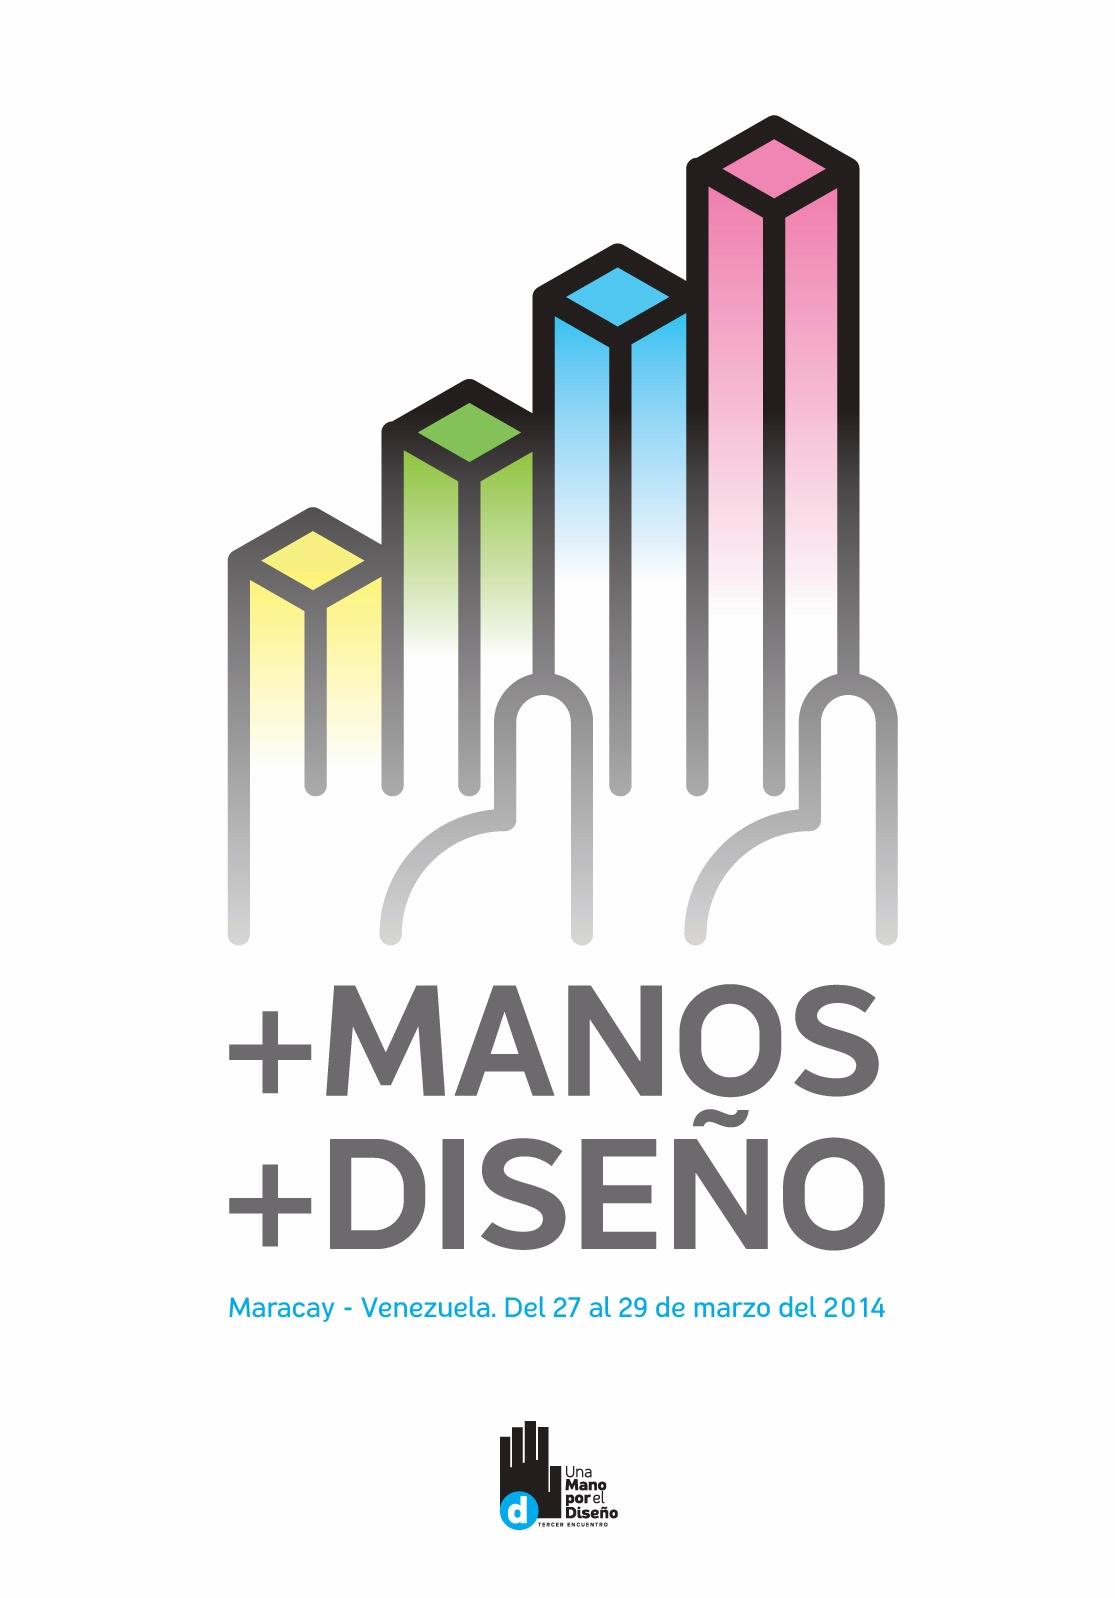 C rculo de dise o maracay for Diseno de interiores venezuela